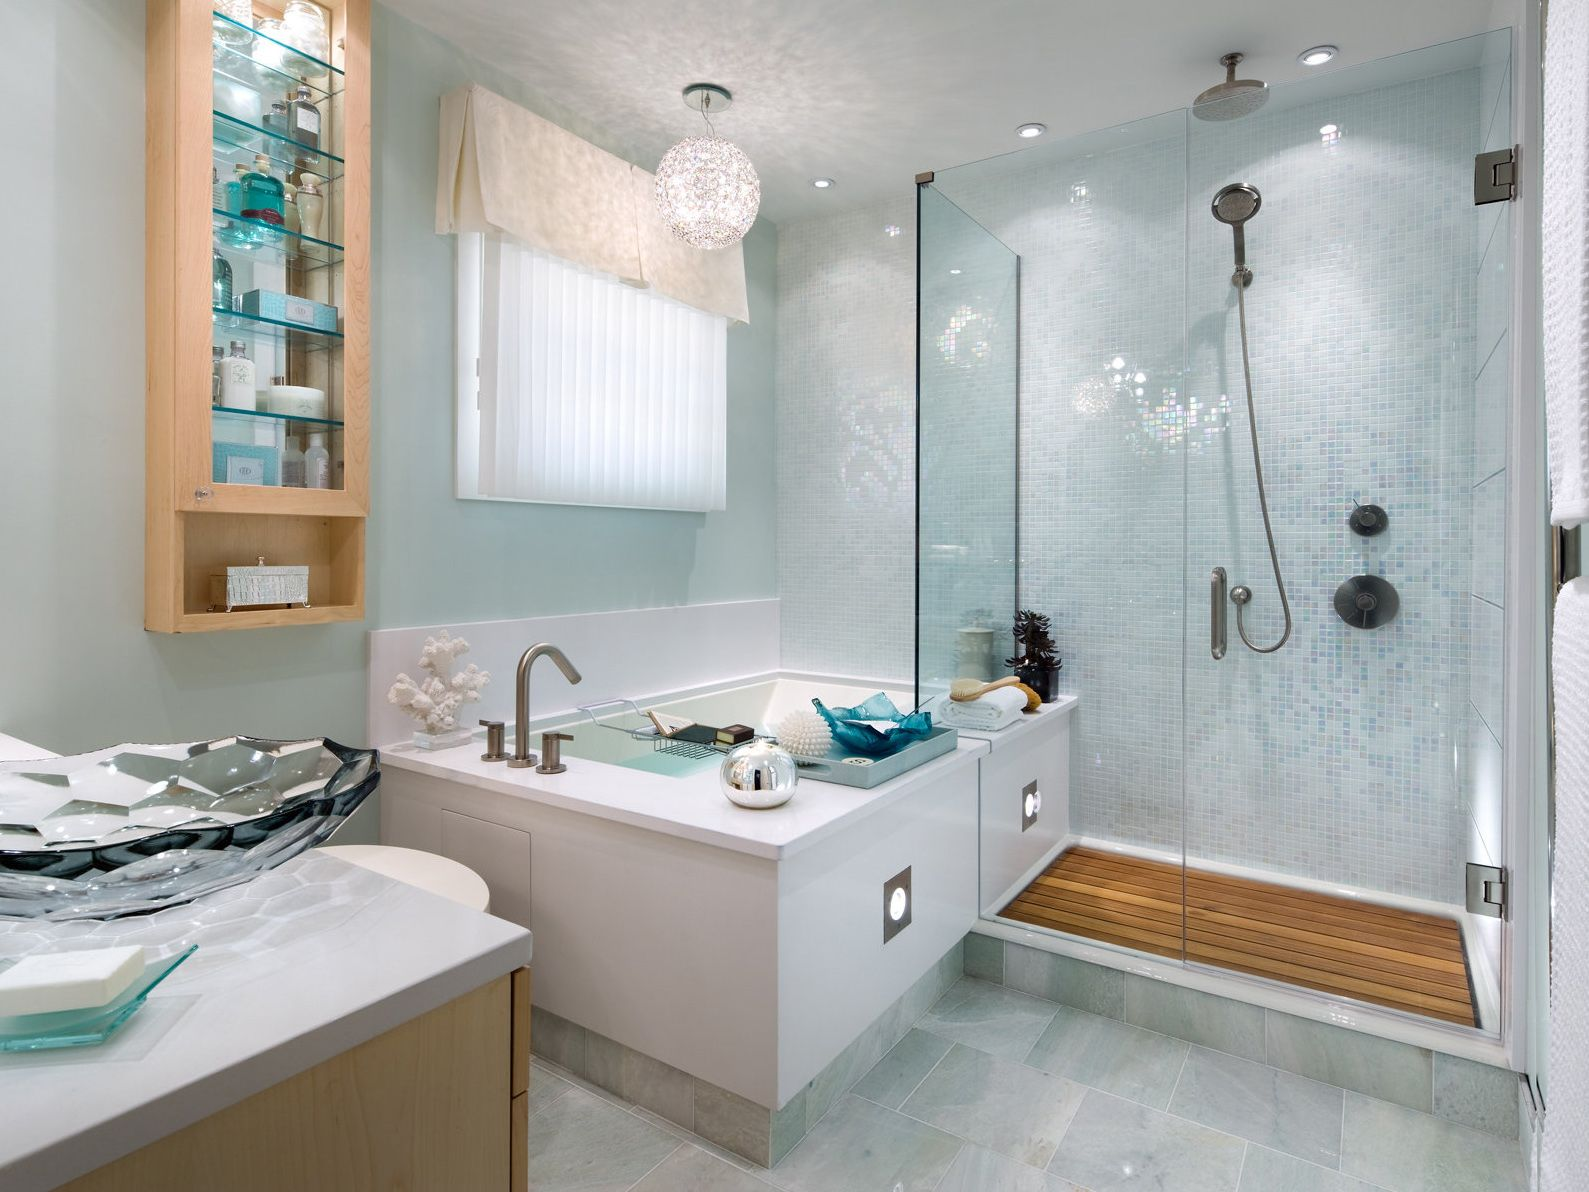 Candice Olson Bathroom Design 20 Beautiful Beach Style Bathroom Design Ideas  Bathroom Designs